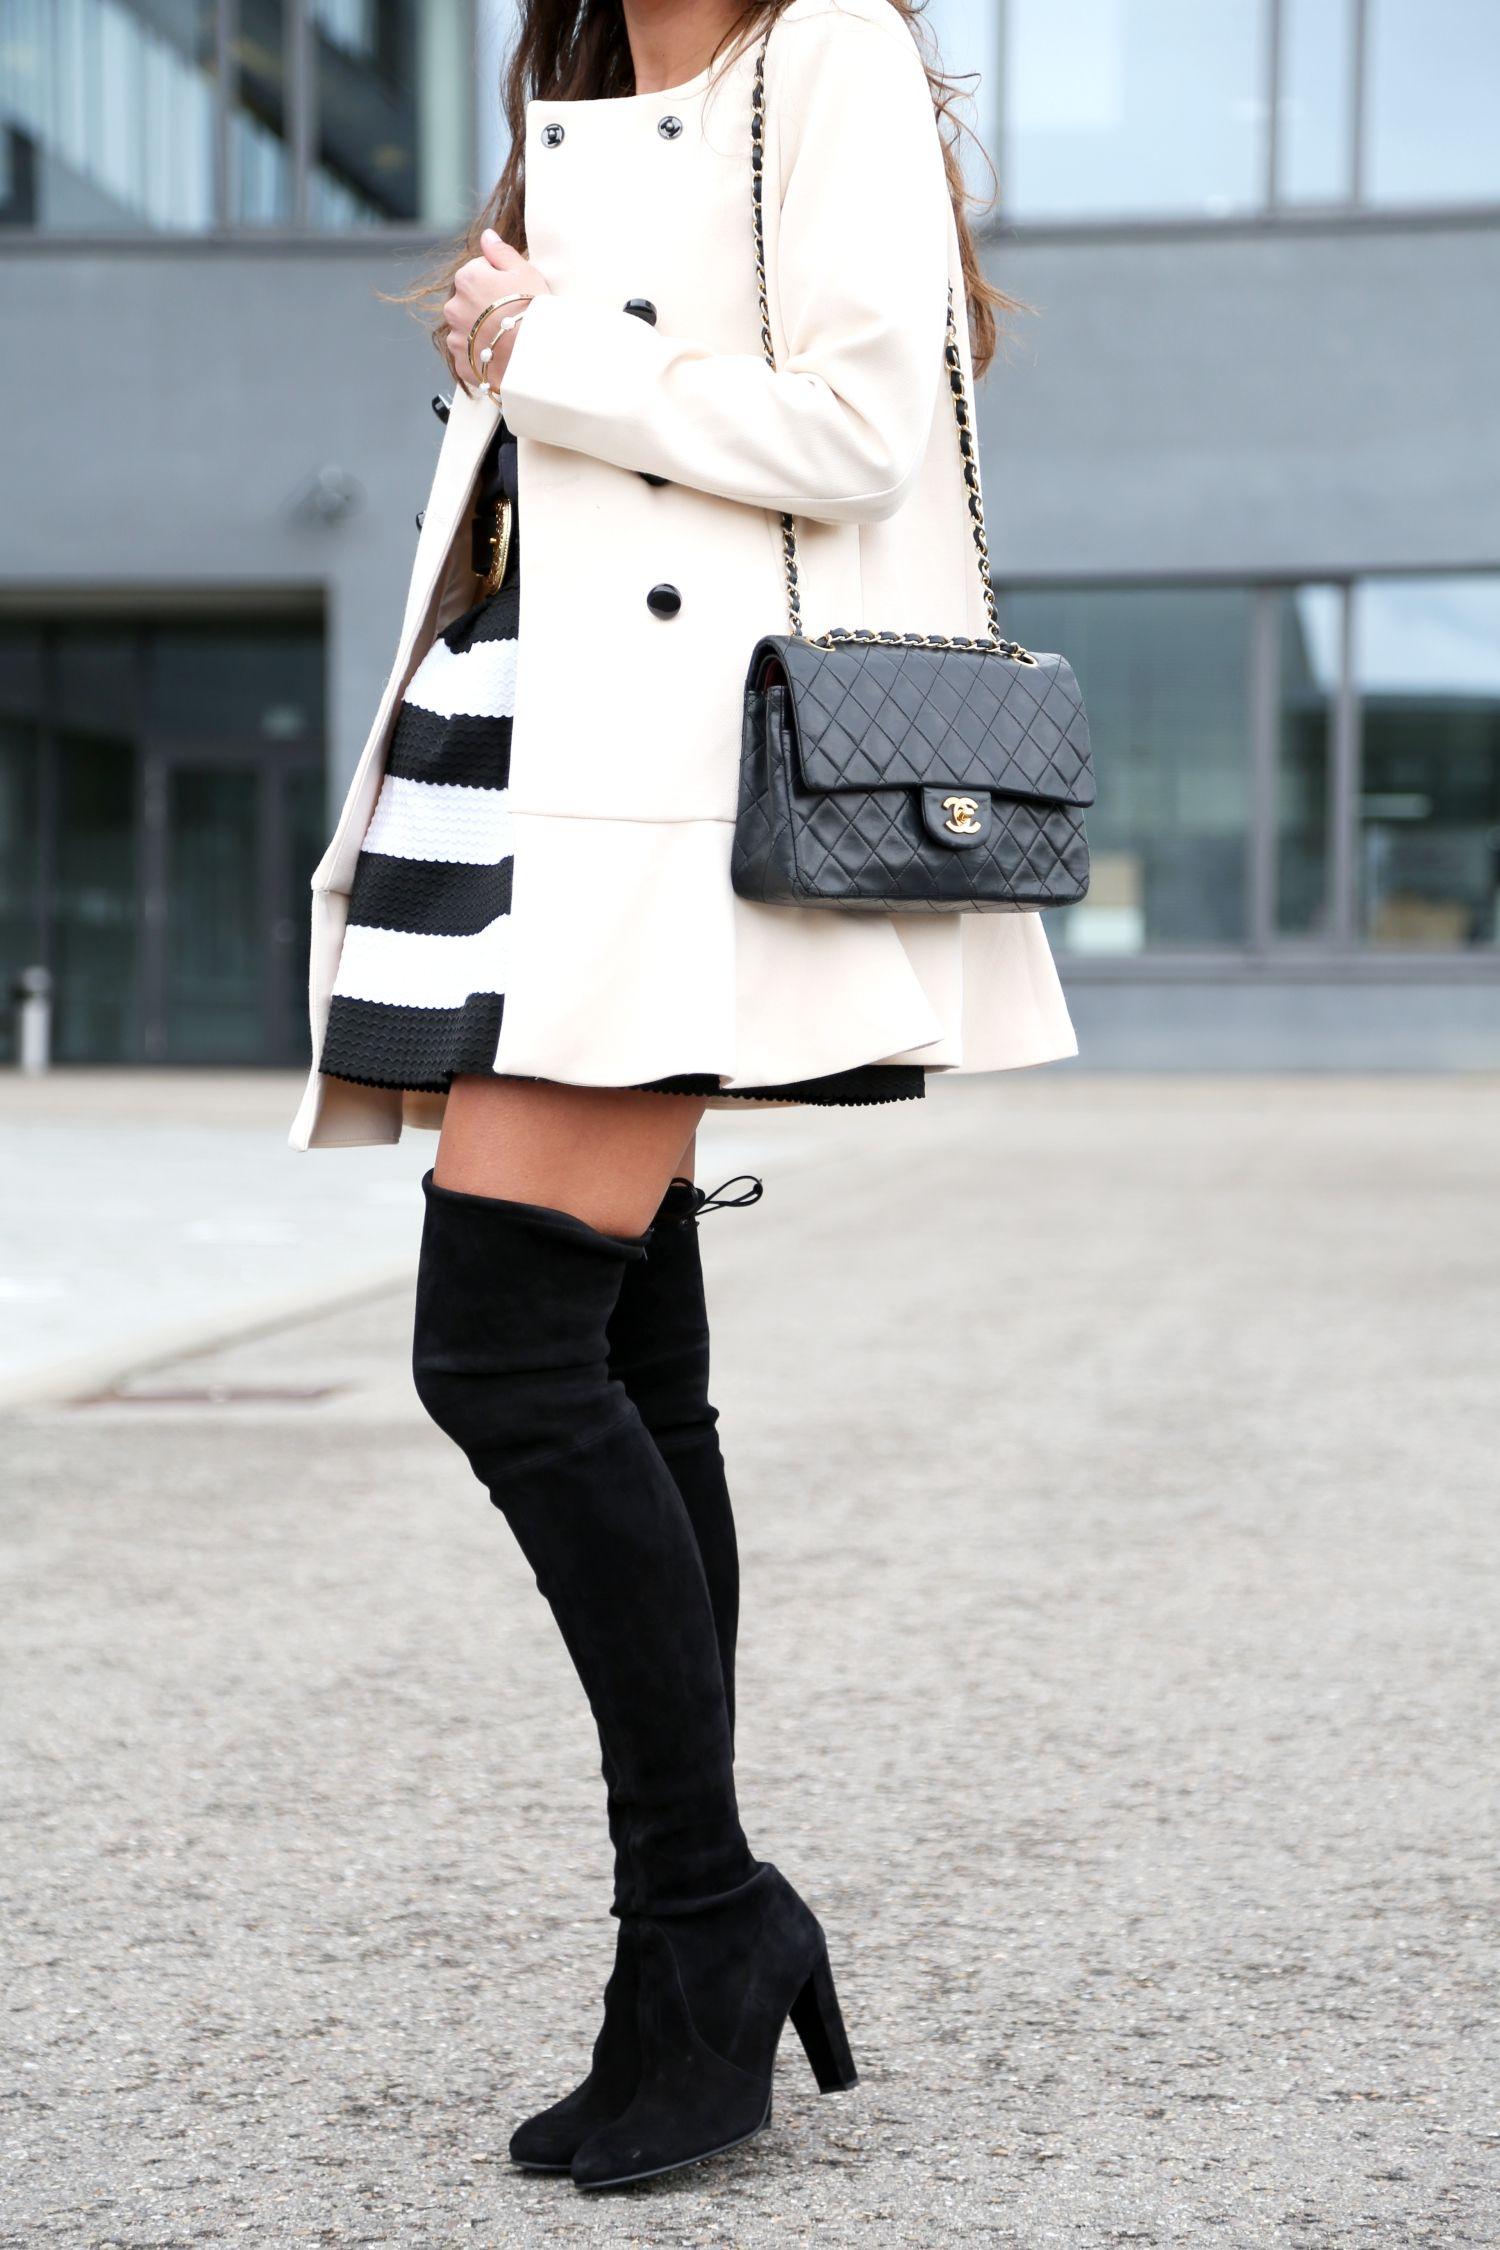 33d174423b4 outfit-details-stuart-weitzman-overknees-skirt-chanel-bag-2.55